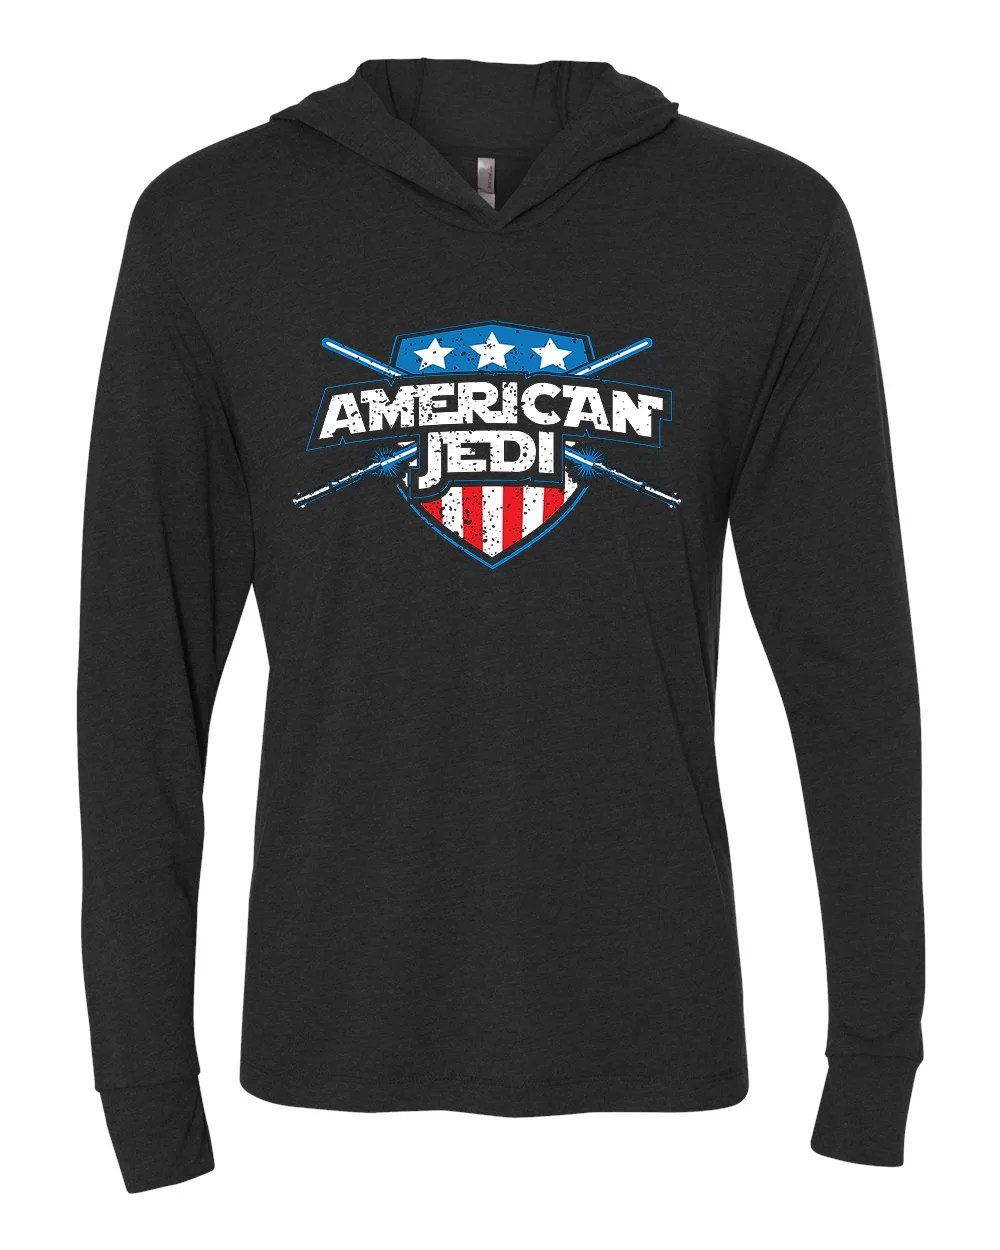 American Jedi hoodie (lightweight)